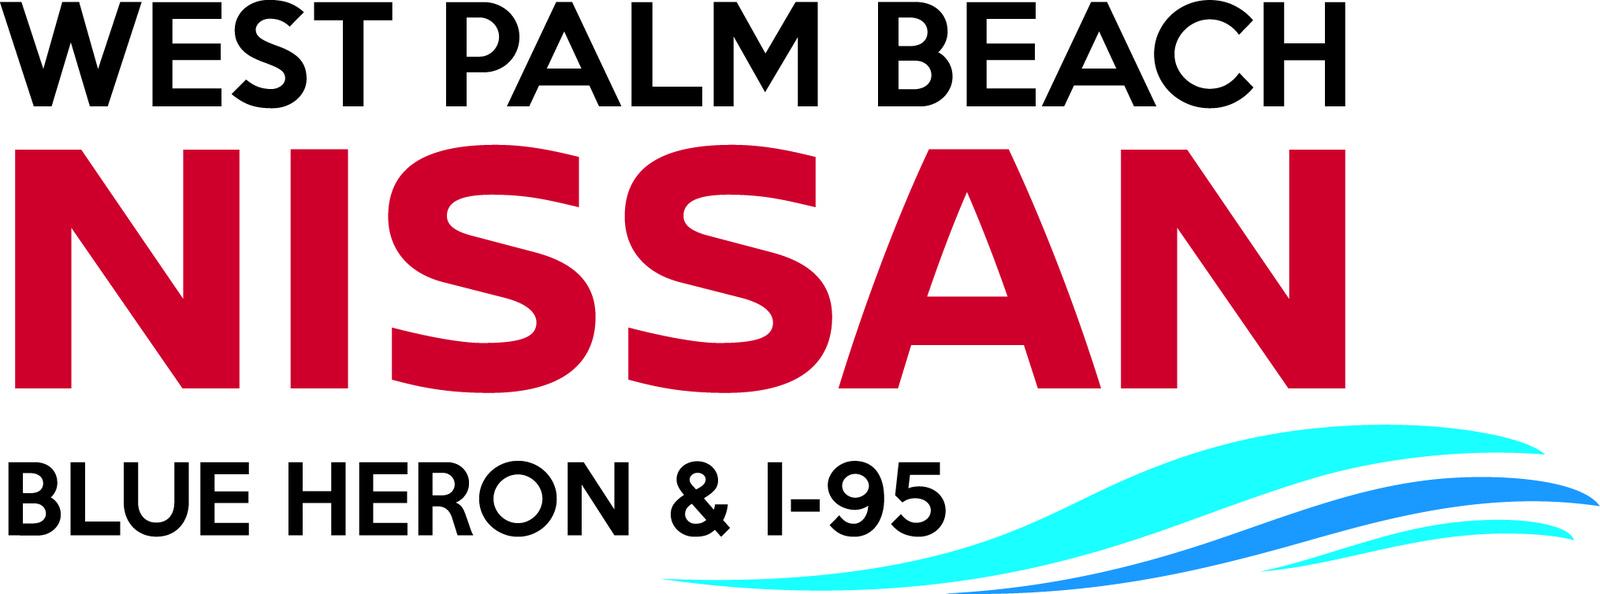 West Palm Beach Nissan Service